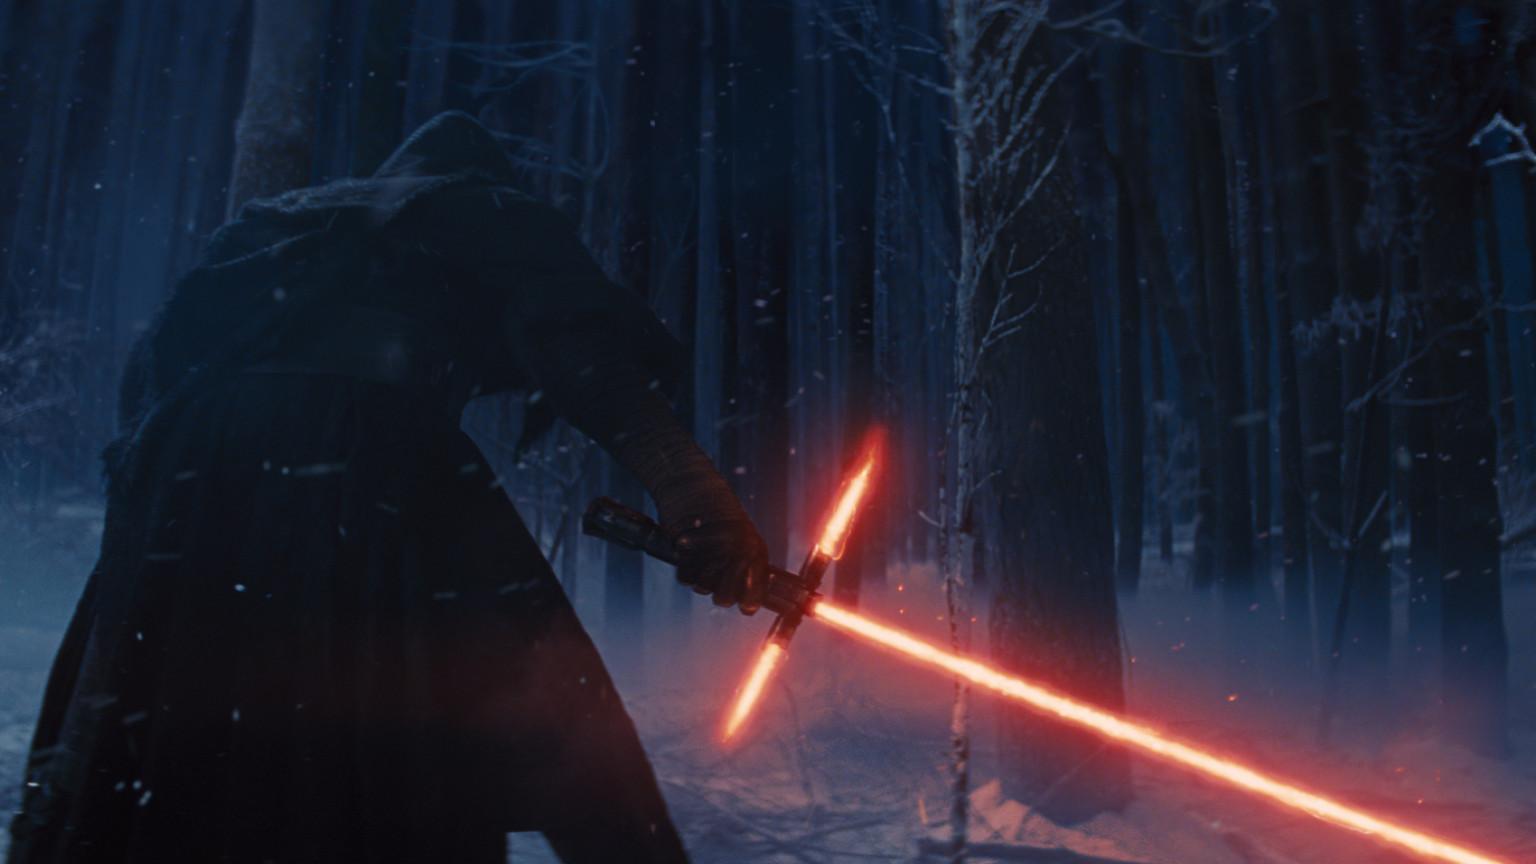 Kylo-Ren with light- saber.